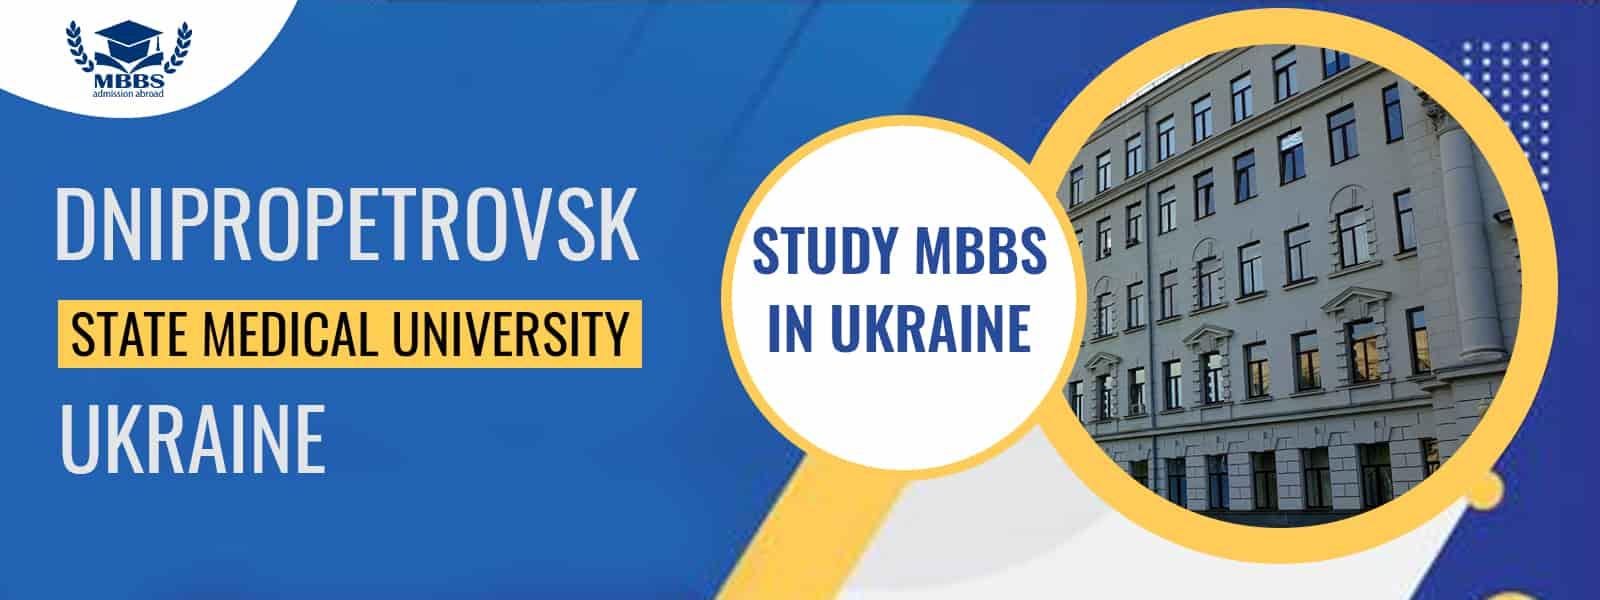 Dnipropetrovsk State Medical Academy Ukraine